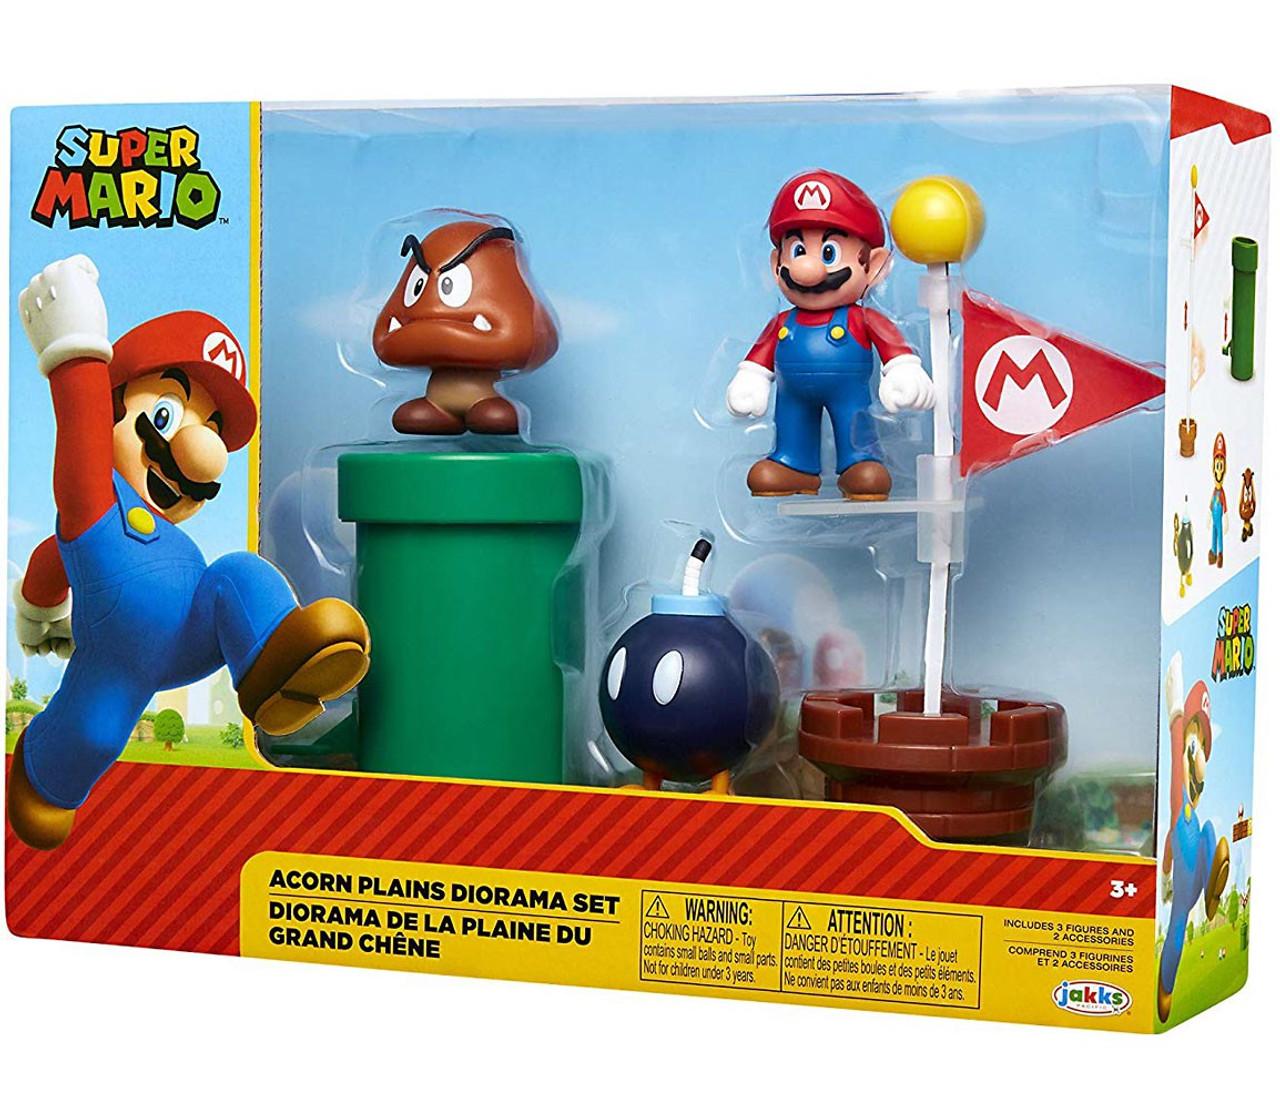 World of Nintendo Super Mario Classic Acorn Plains 2 5-Inch Diorama Gift  Set [Bob-Omb, Mario & Goomba]